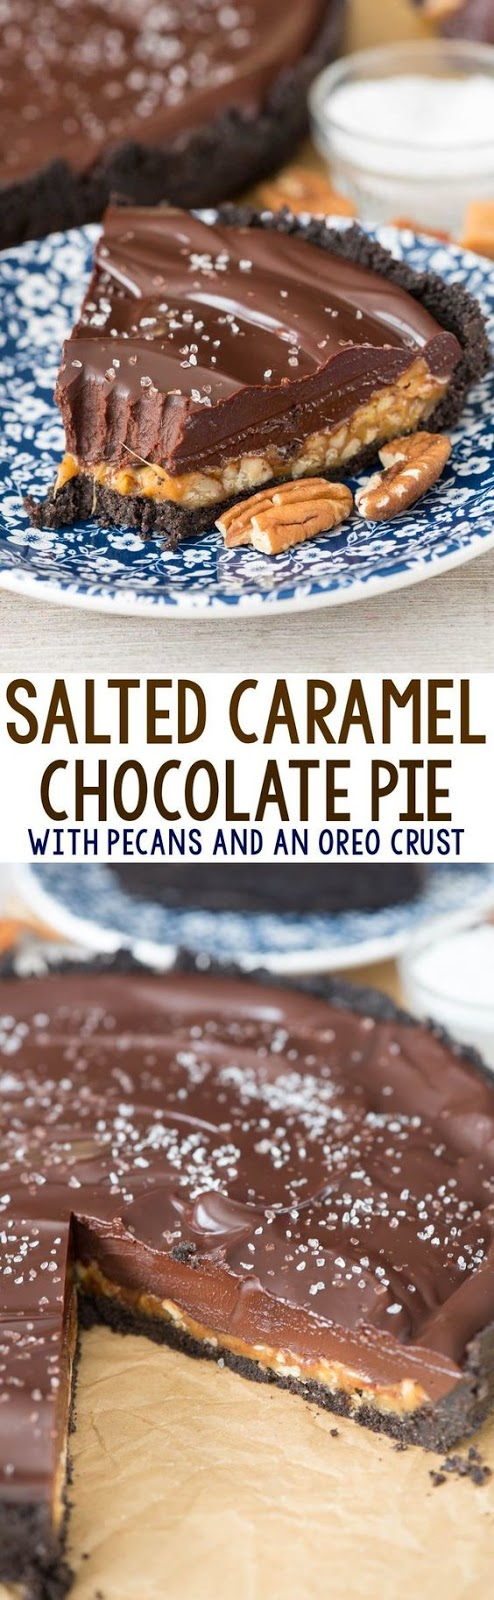 SALTED CARAMEL PECAN CHOCOLATE PIE #Saltedchoco #Caramel #Pecan #chocolate #Chcopie #Bestchocopie #Dessert #bestdessert